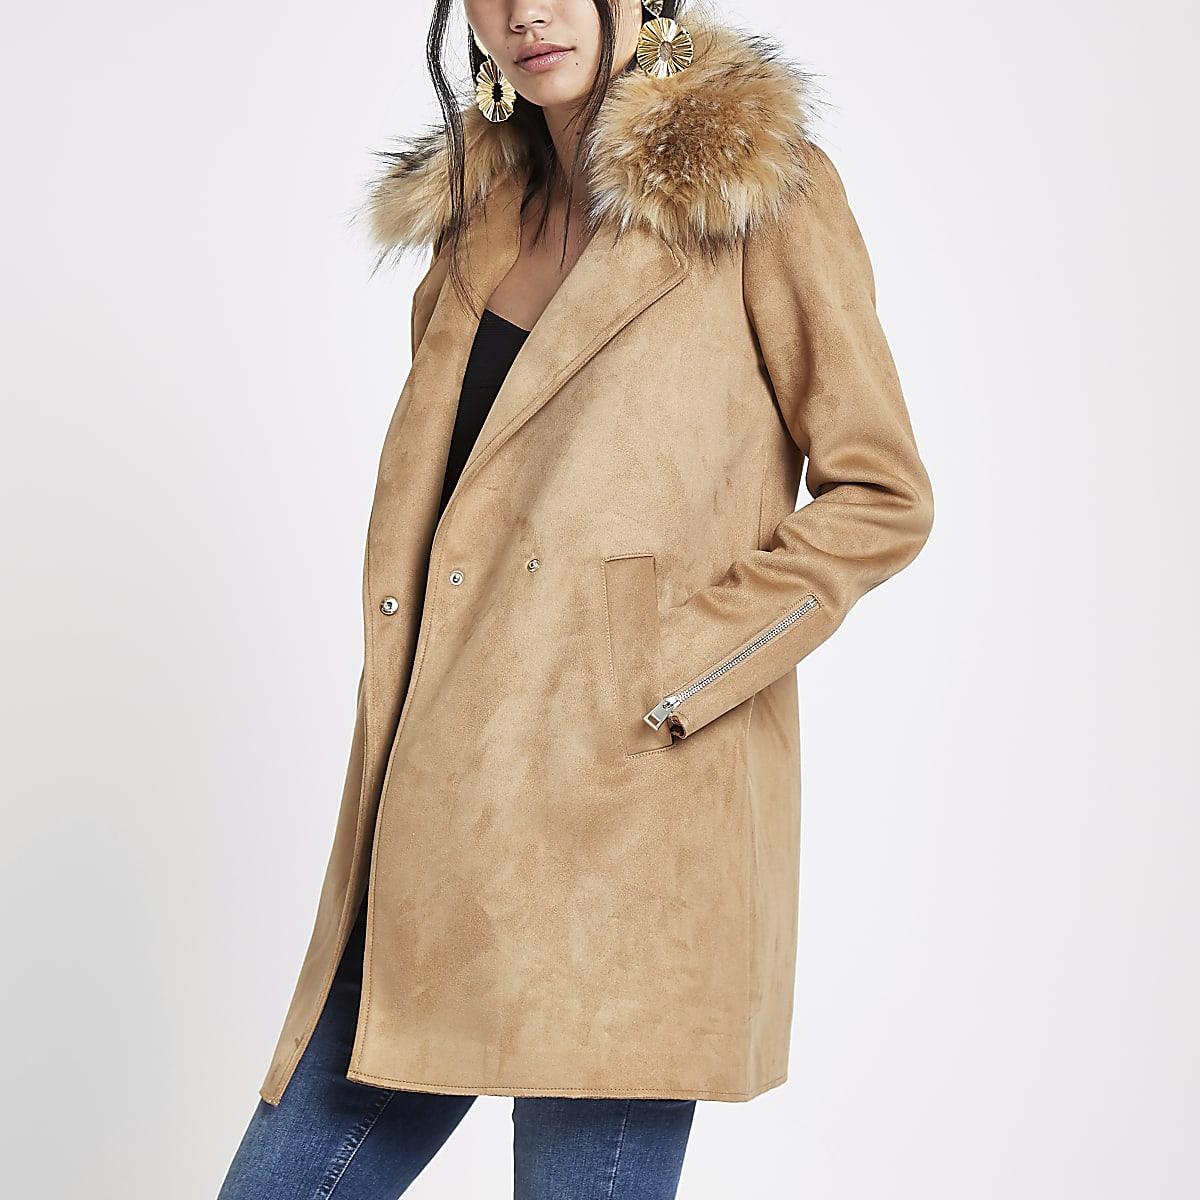 f6c73b7350ad Brown faux fur collar swing coat - Coats - Coats   Jackets - women